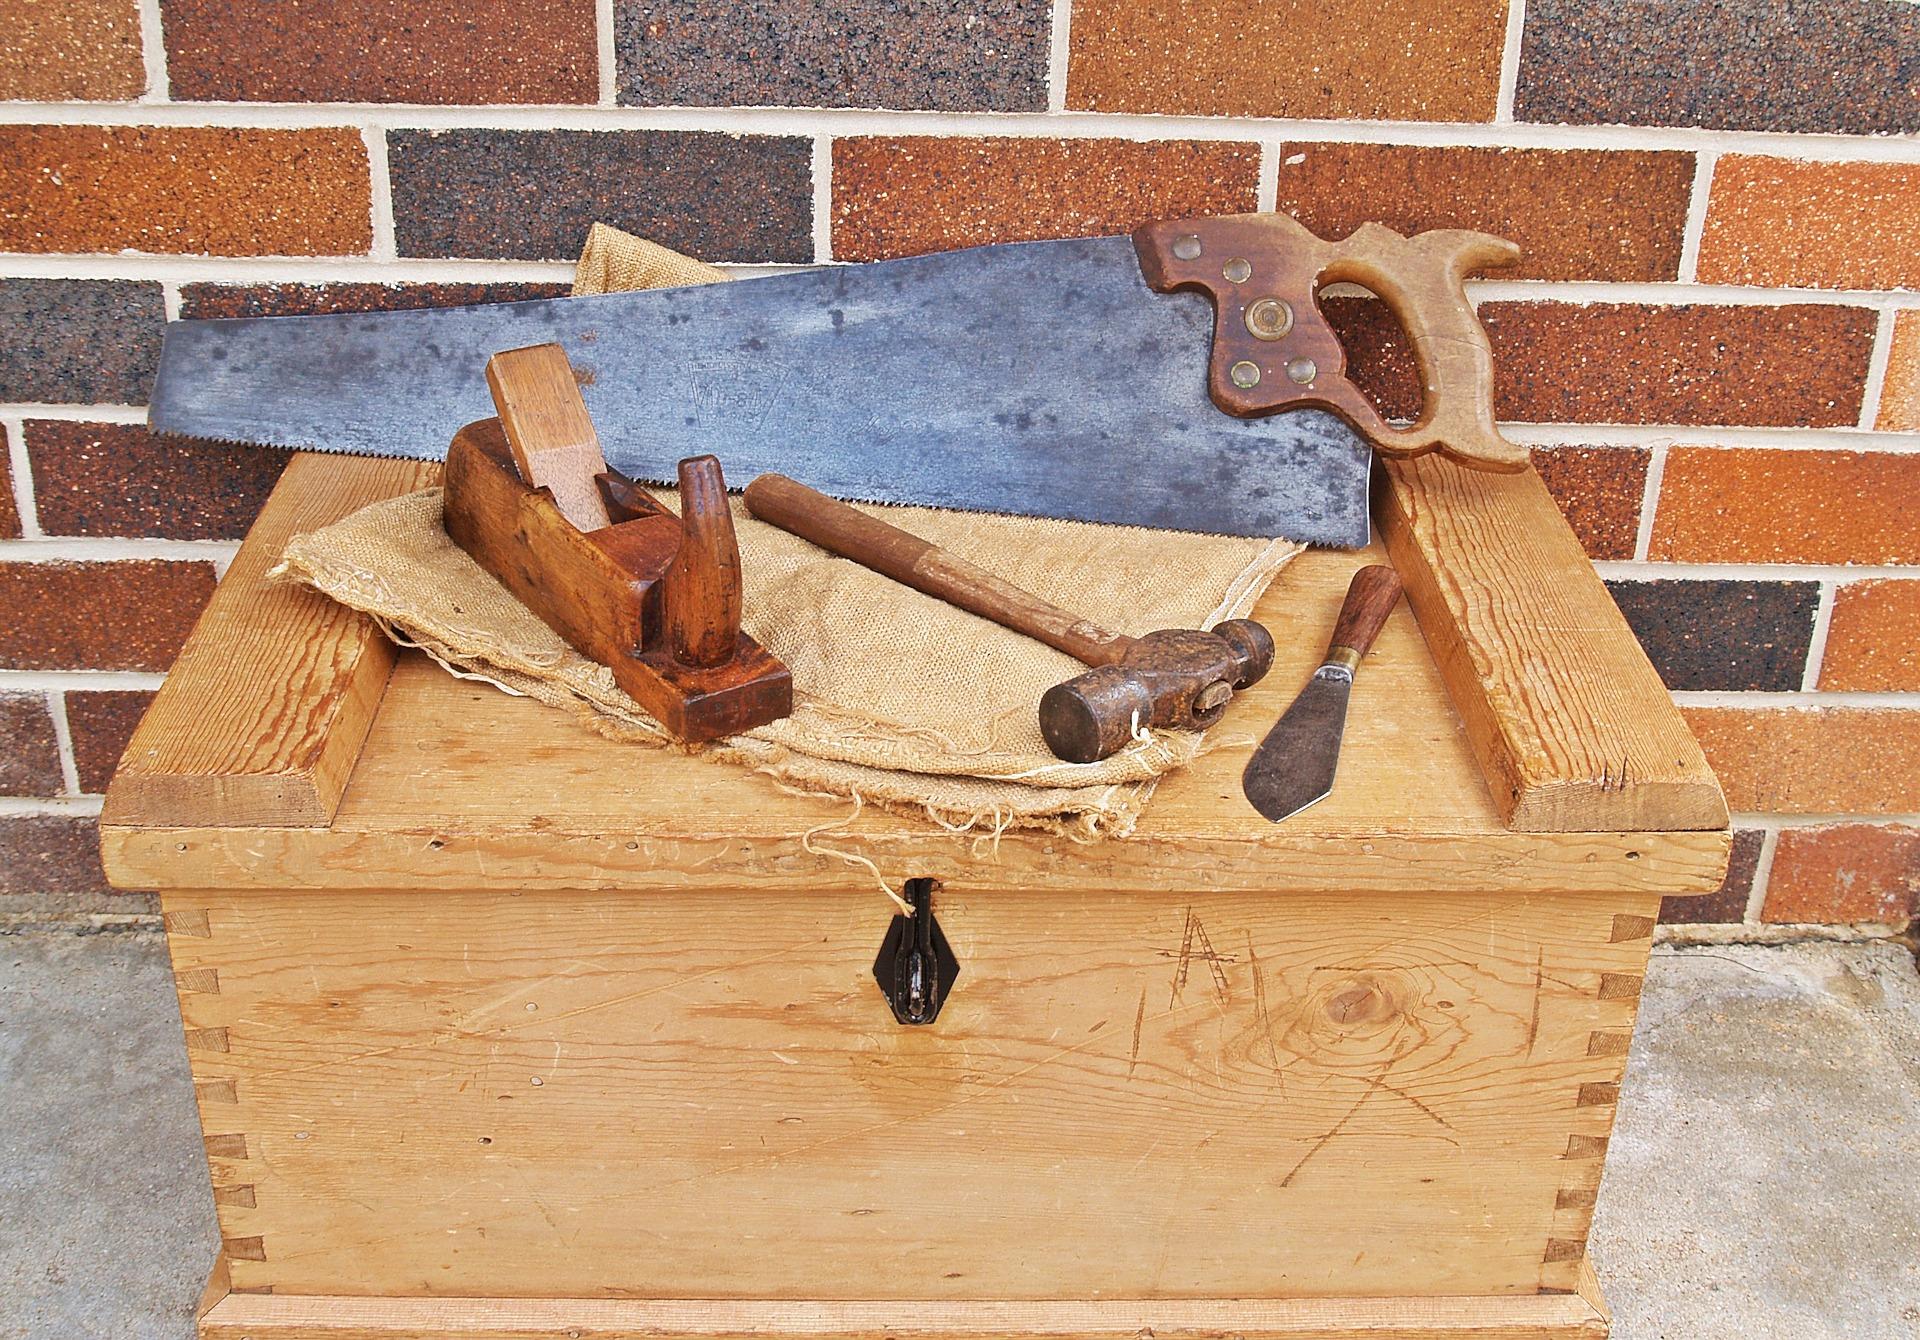 carpenters-toolbox-1466467_1920